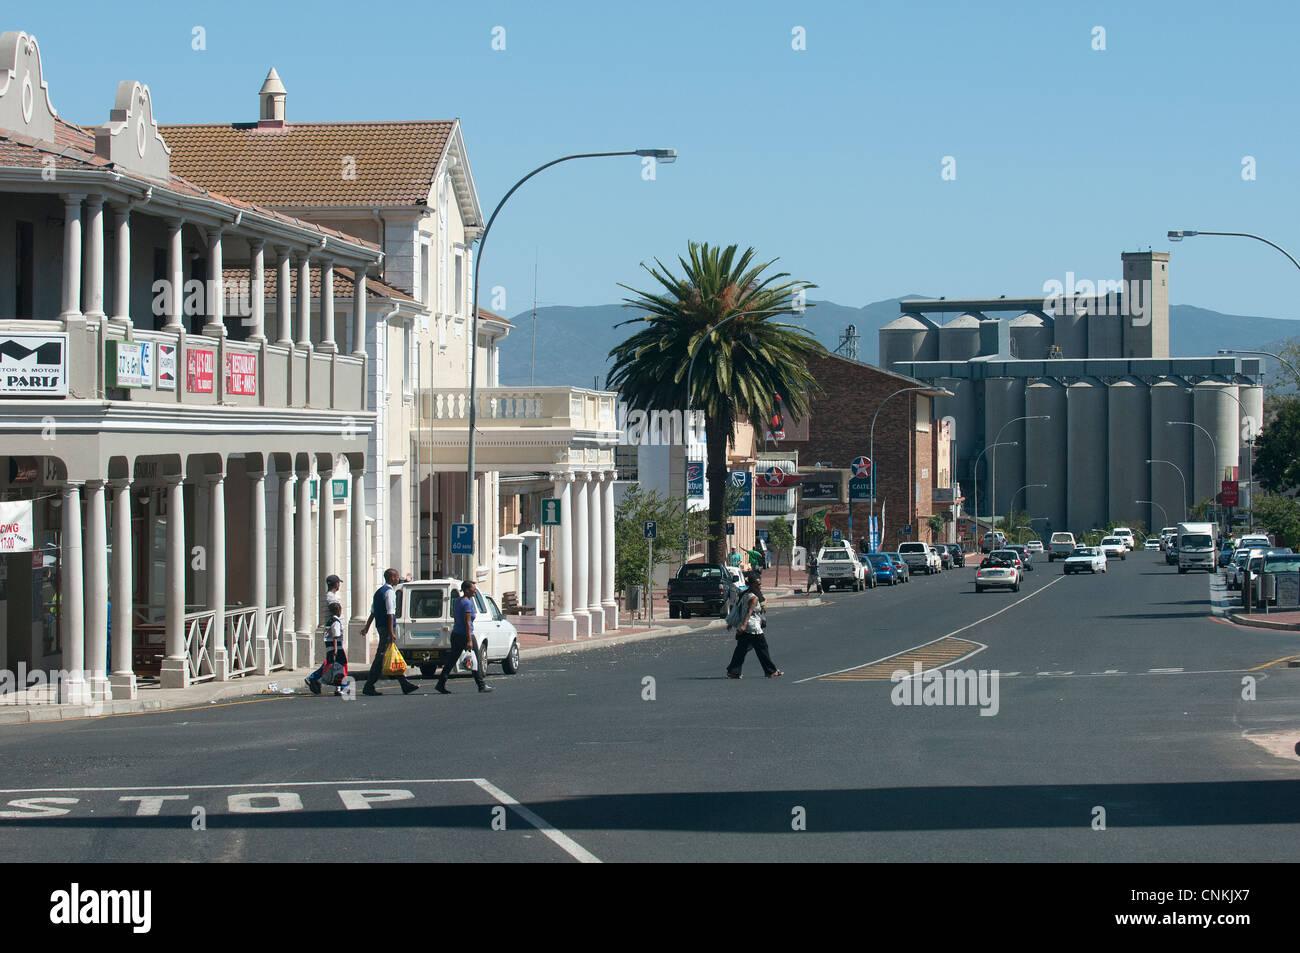 remise spéciale de design distinctif meilleur site Caledon an agricultural town in the Overberg Western Cape ...